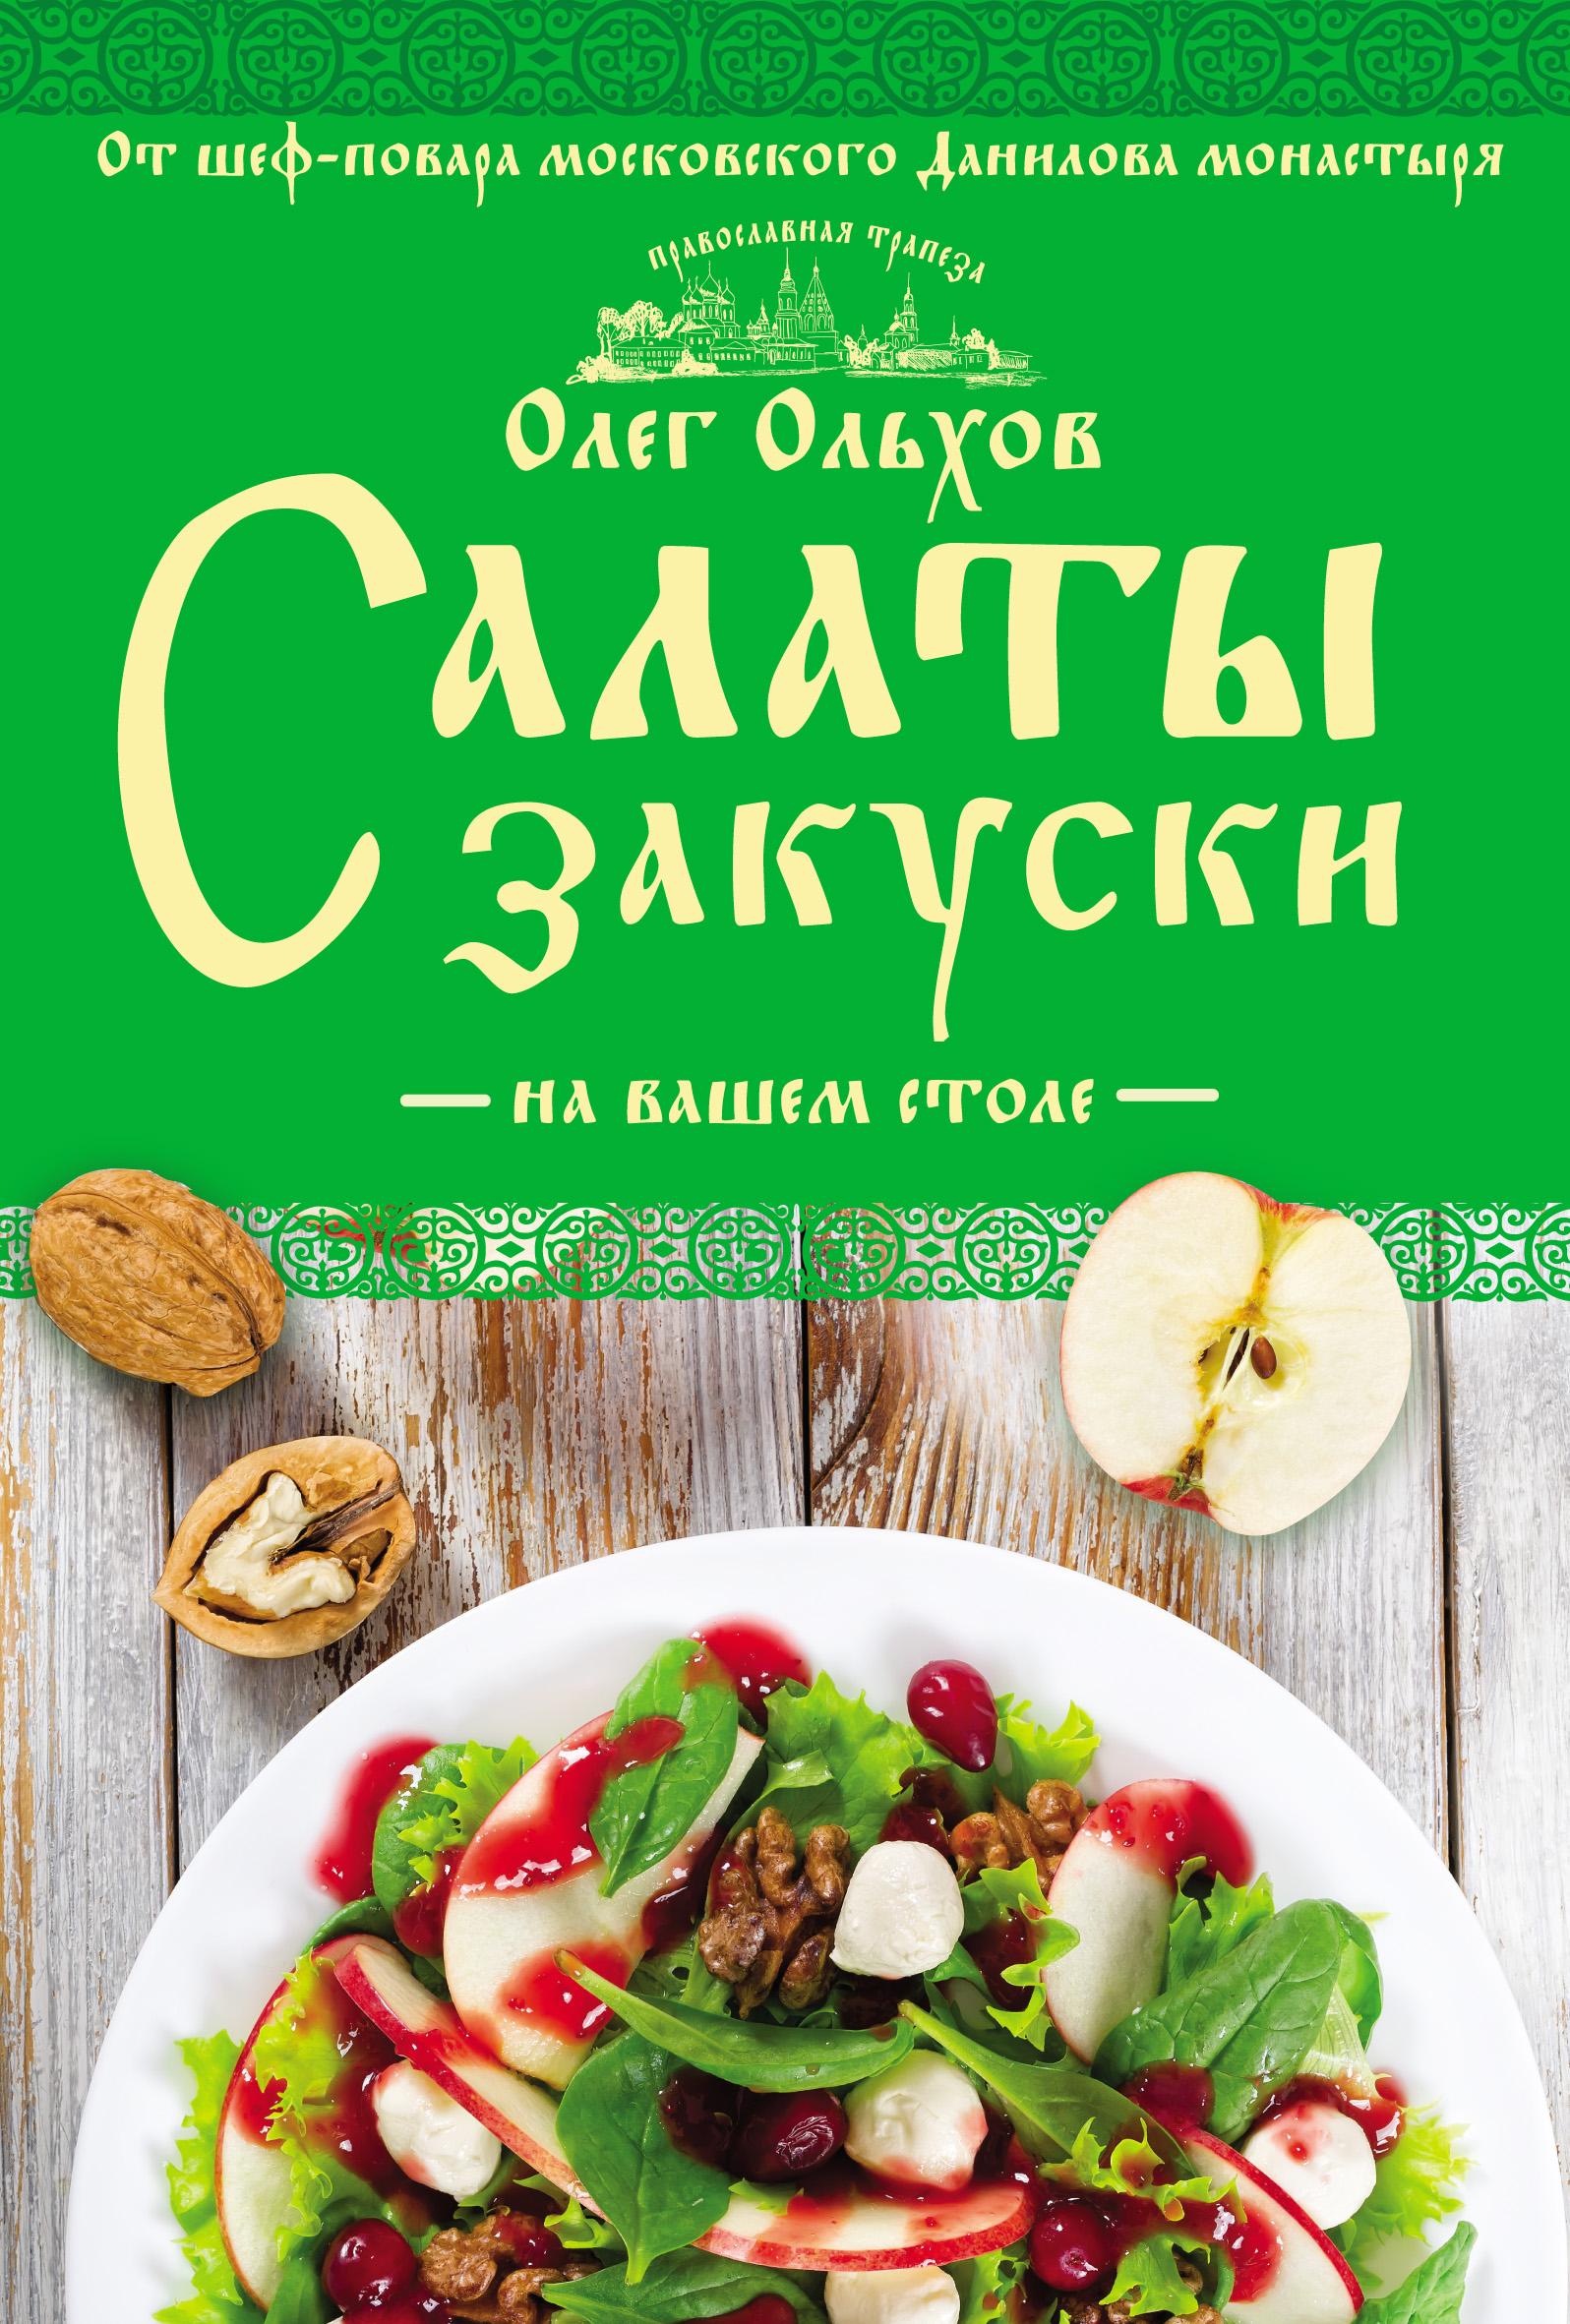 калинина а салаты и закуски на вашем столе Олег Ольхов Салаты. Закуски на вашем столе